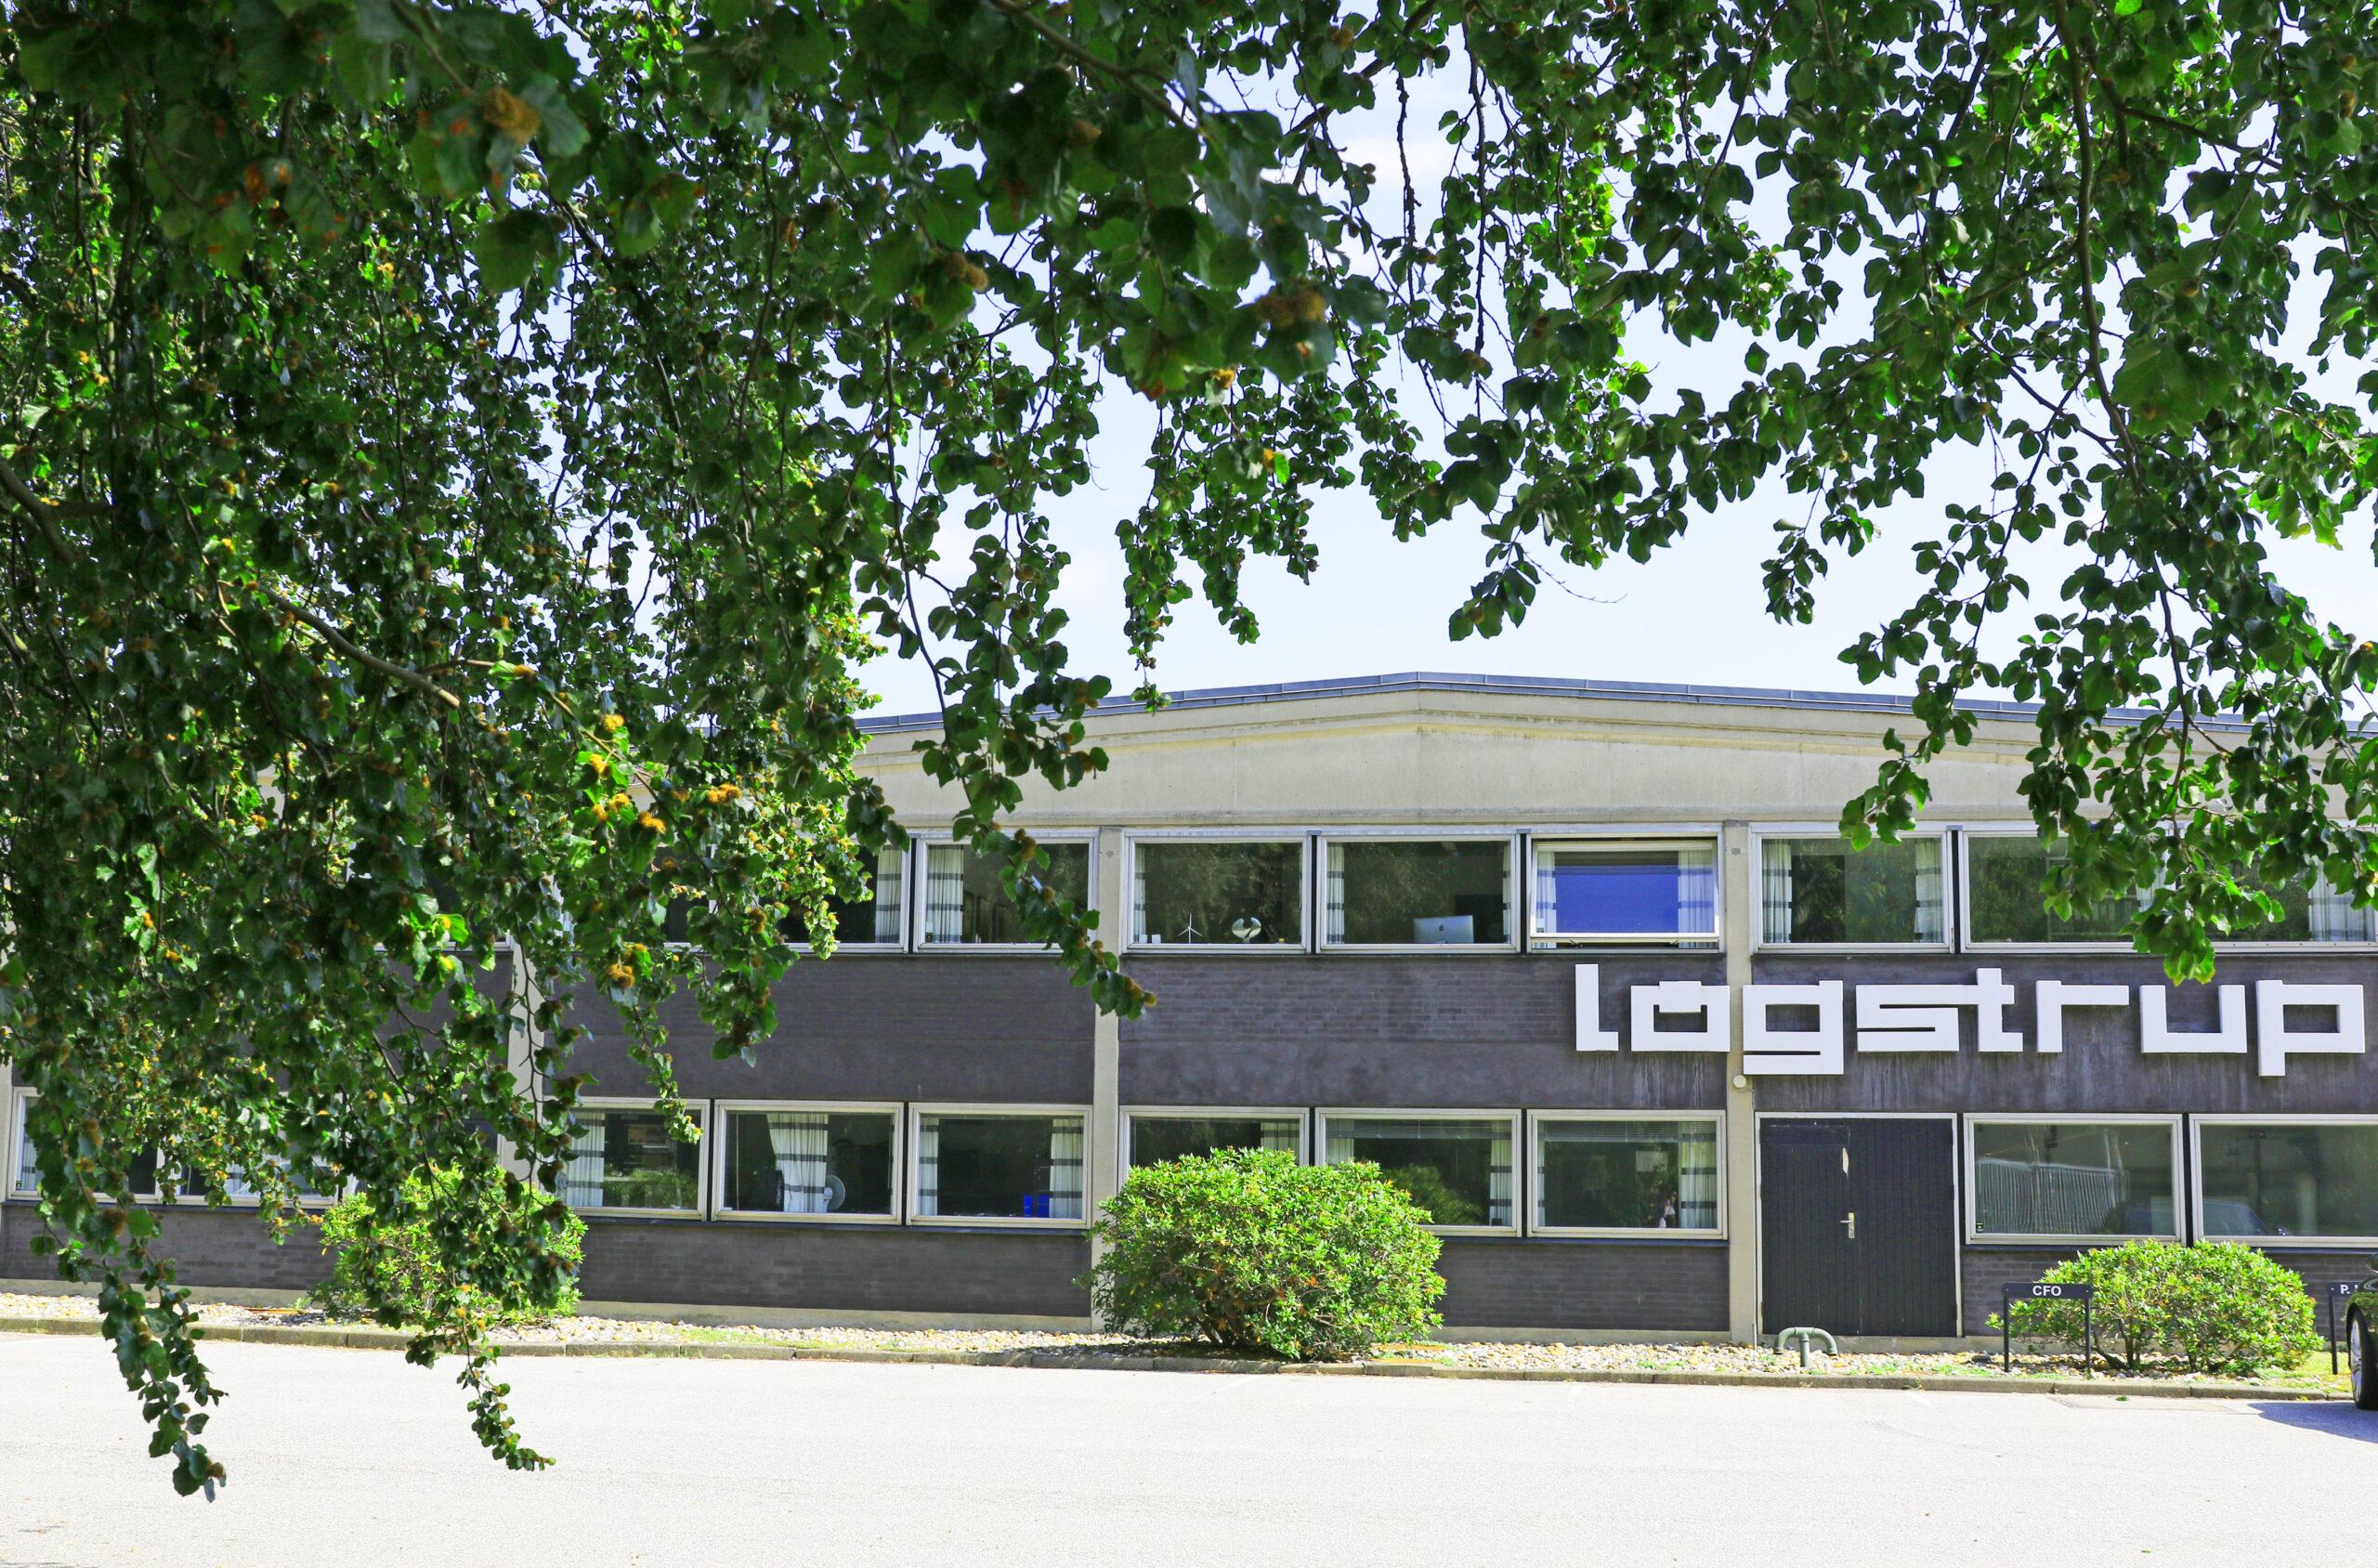 Logstrup Steel's headquarter in Denmark, Kvistgaard